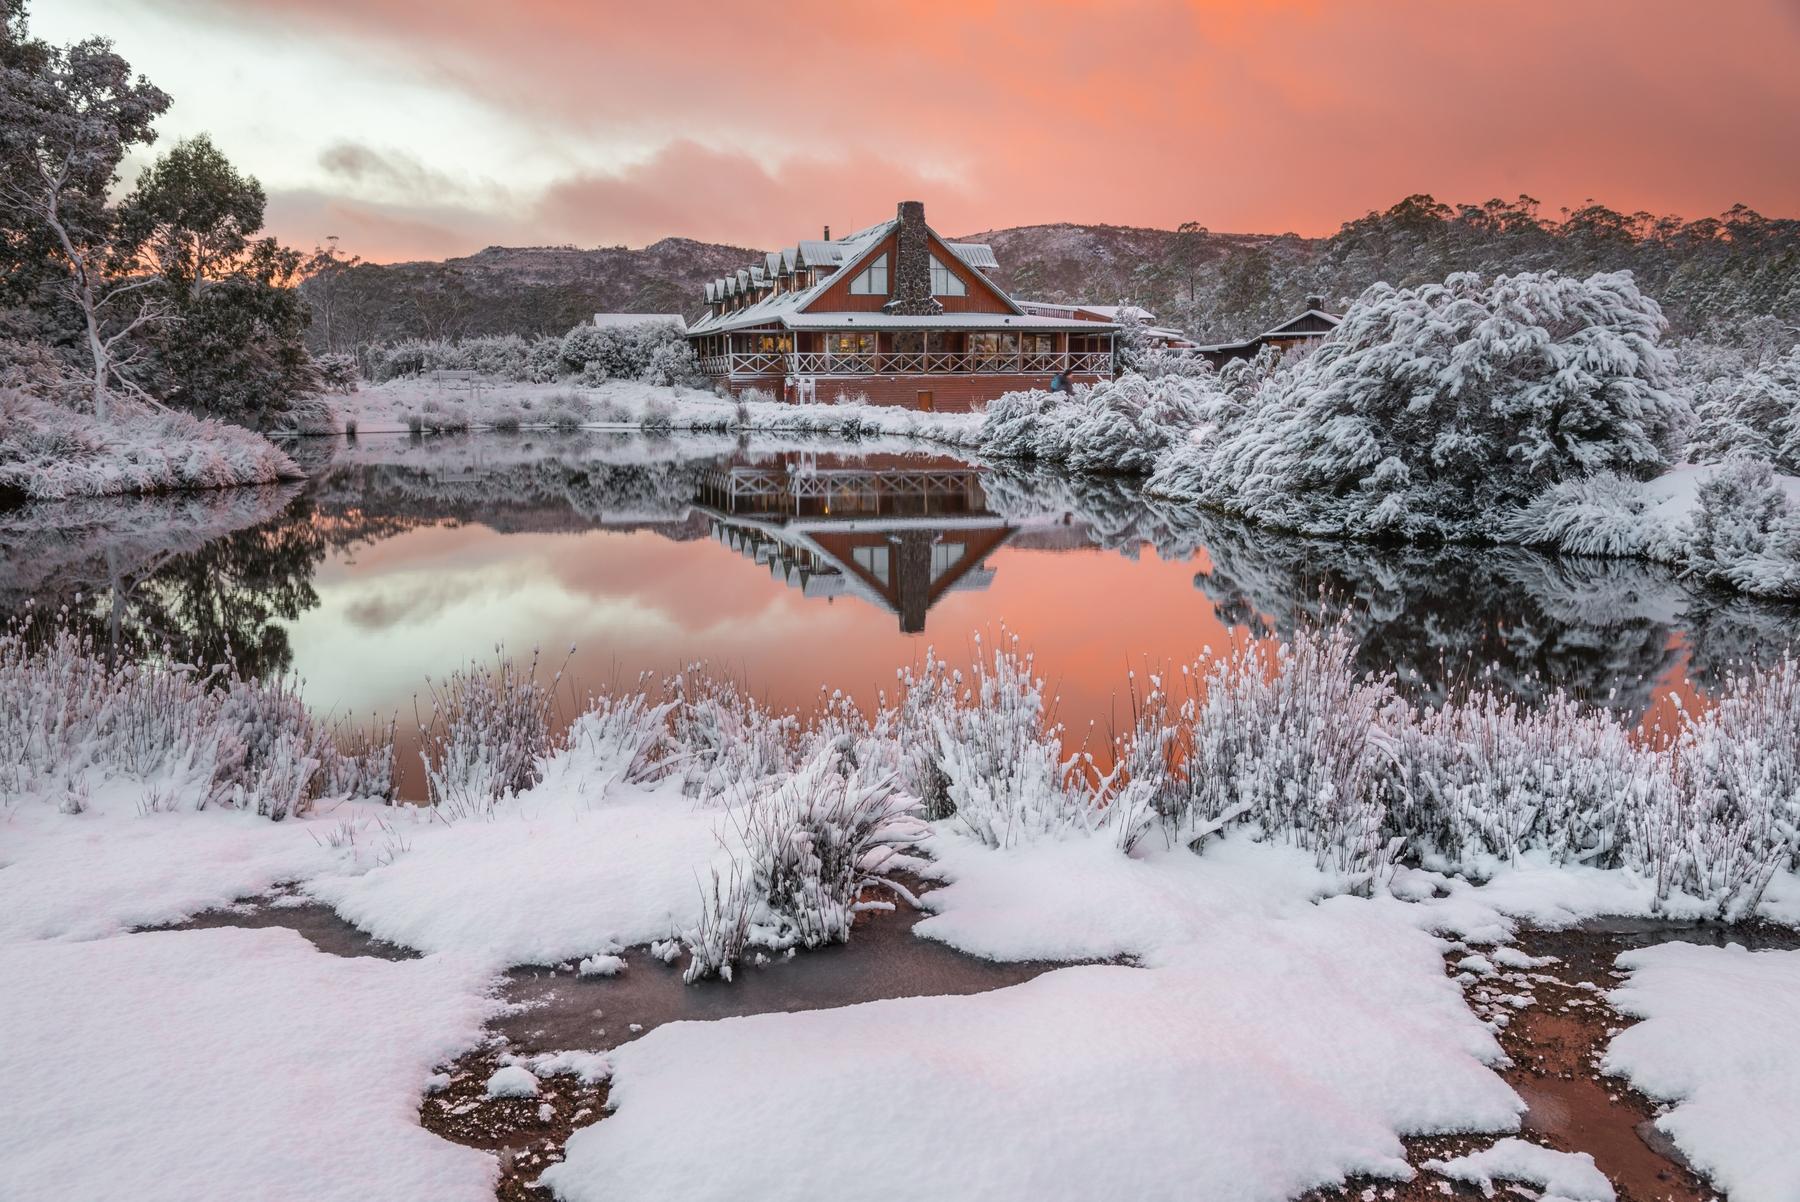 Peppers Cradle Mountain Lodge in Tasmania